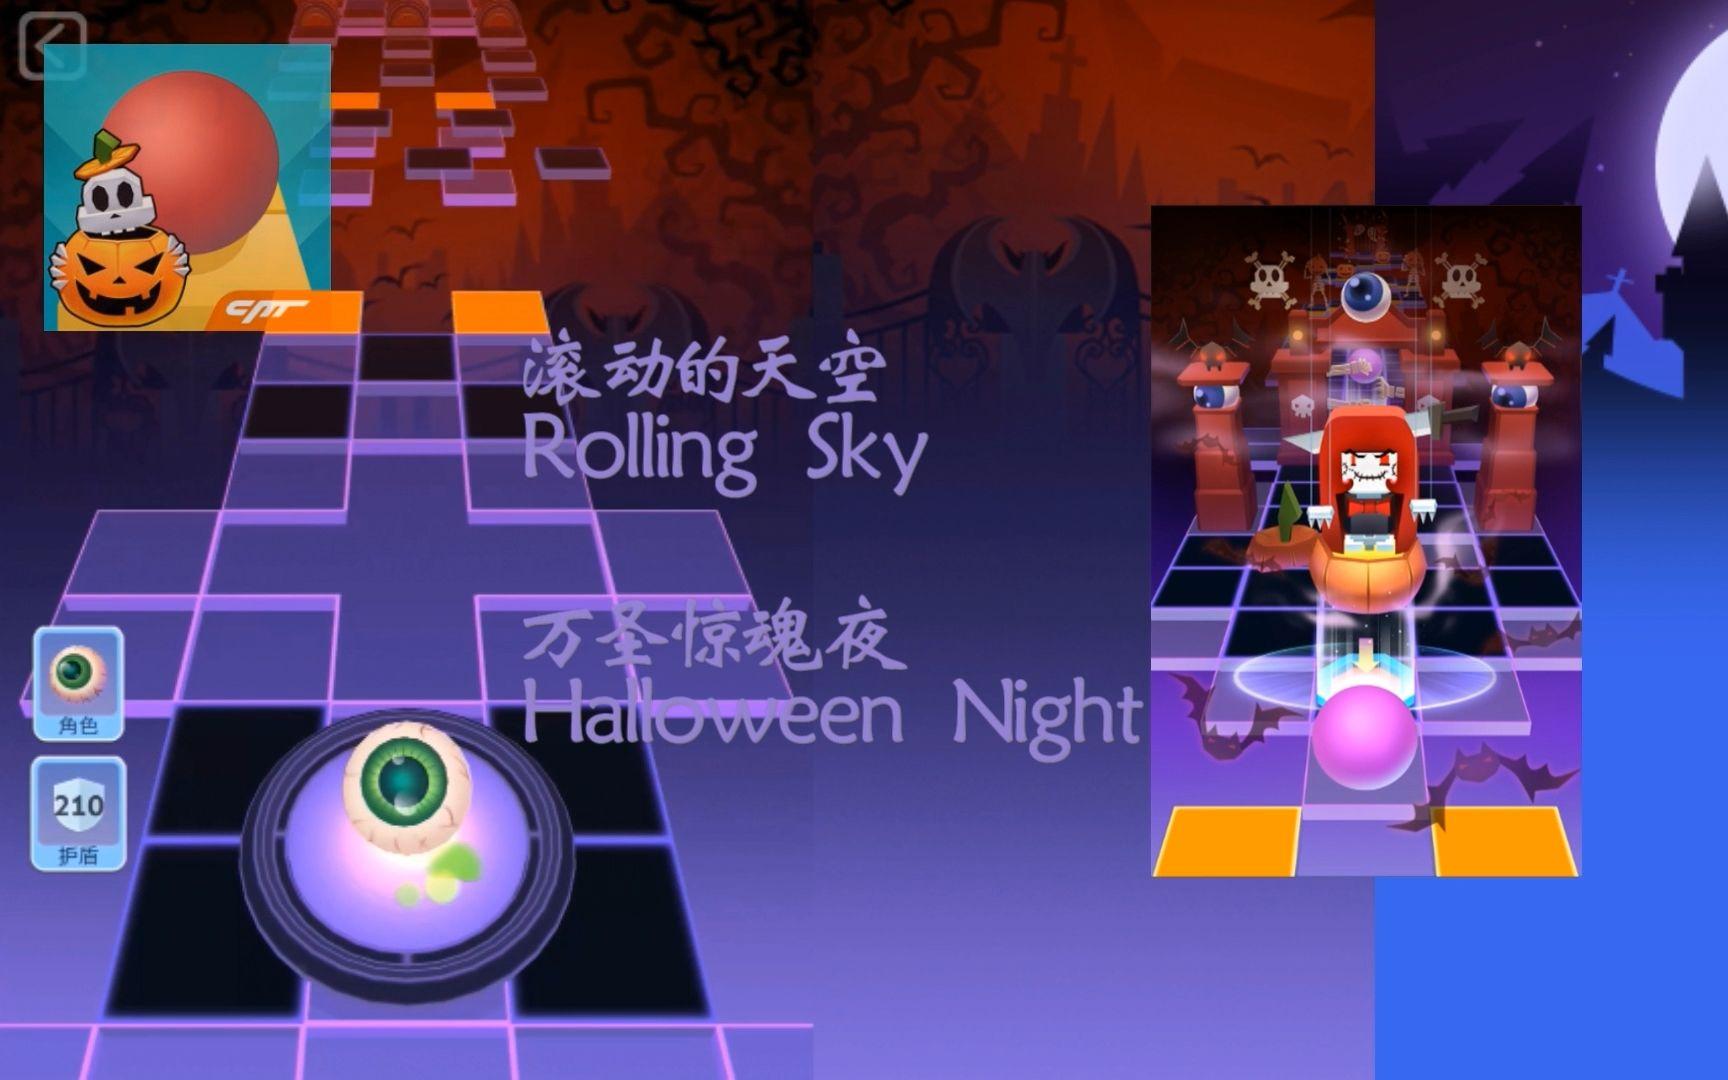 Rolling Sky Halloween Night.滚动的天空 Rolling Sky 万圣惊魂夜 Halloween Night 哔哩哔哩 つロ 干杯 Bilibili